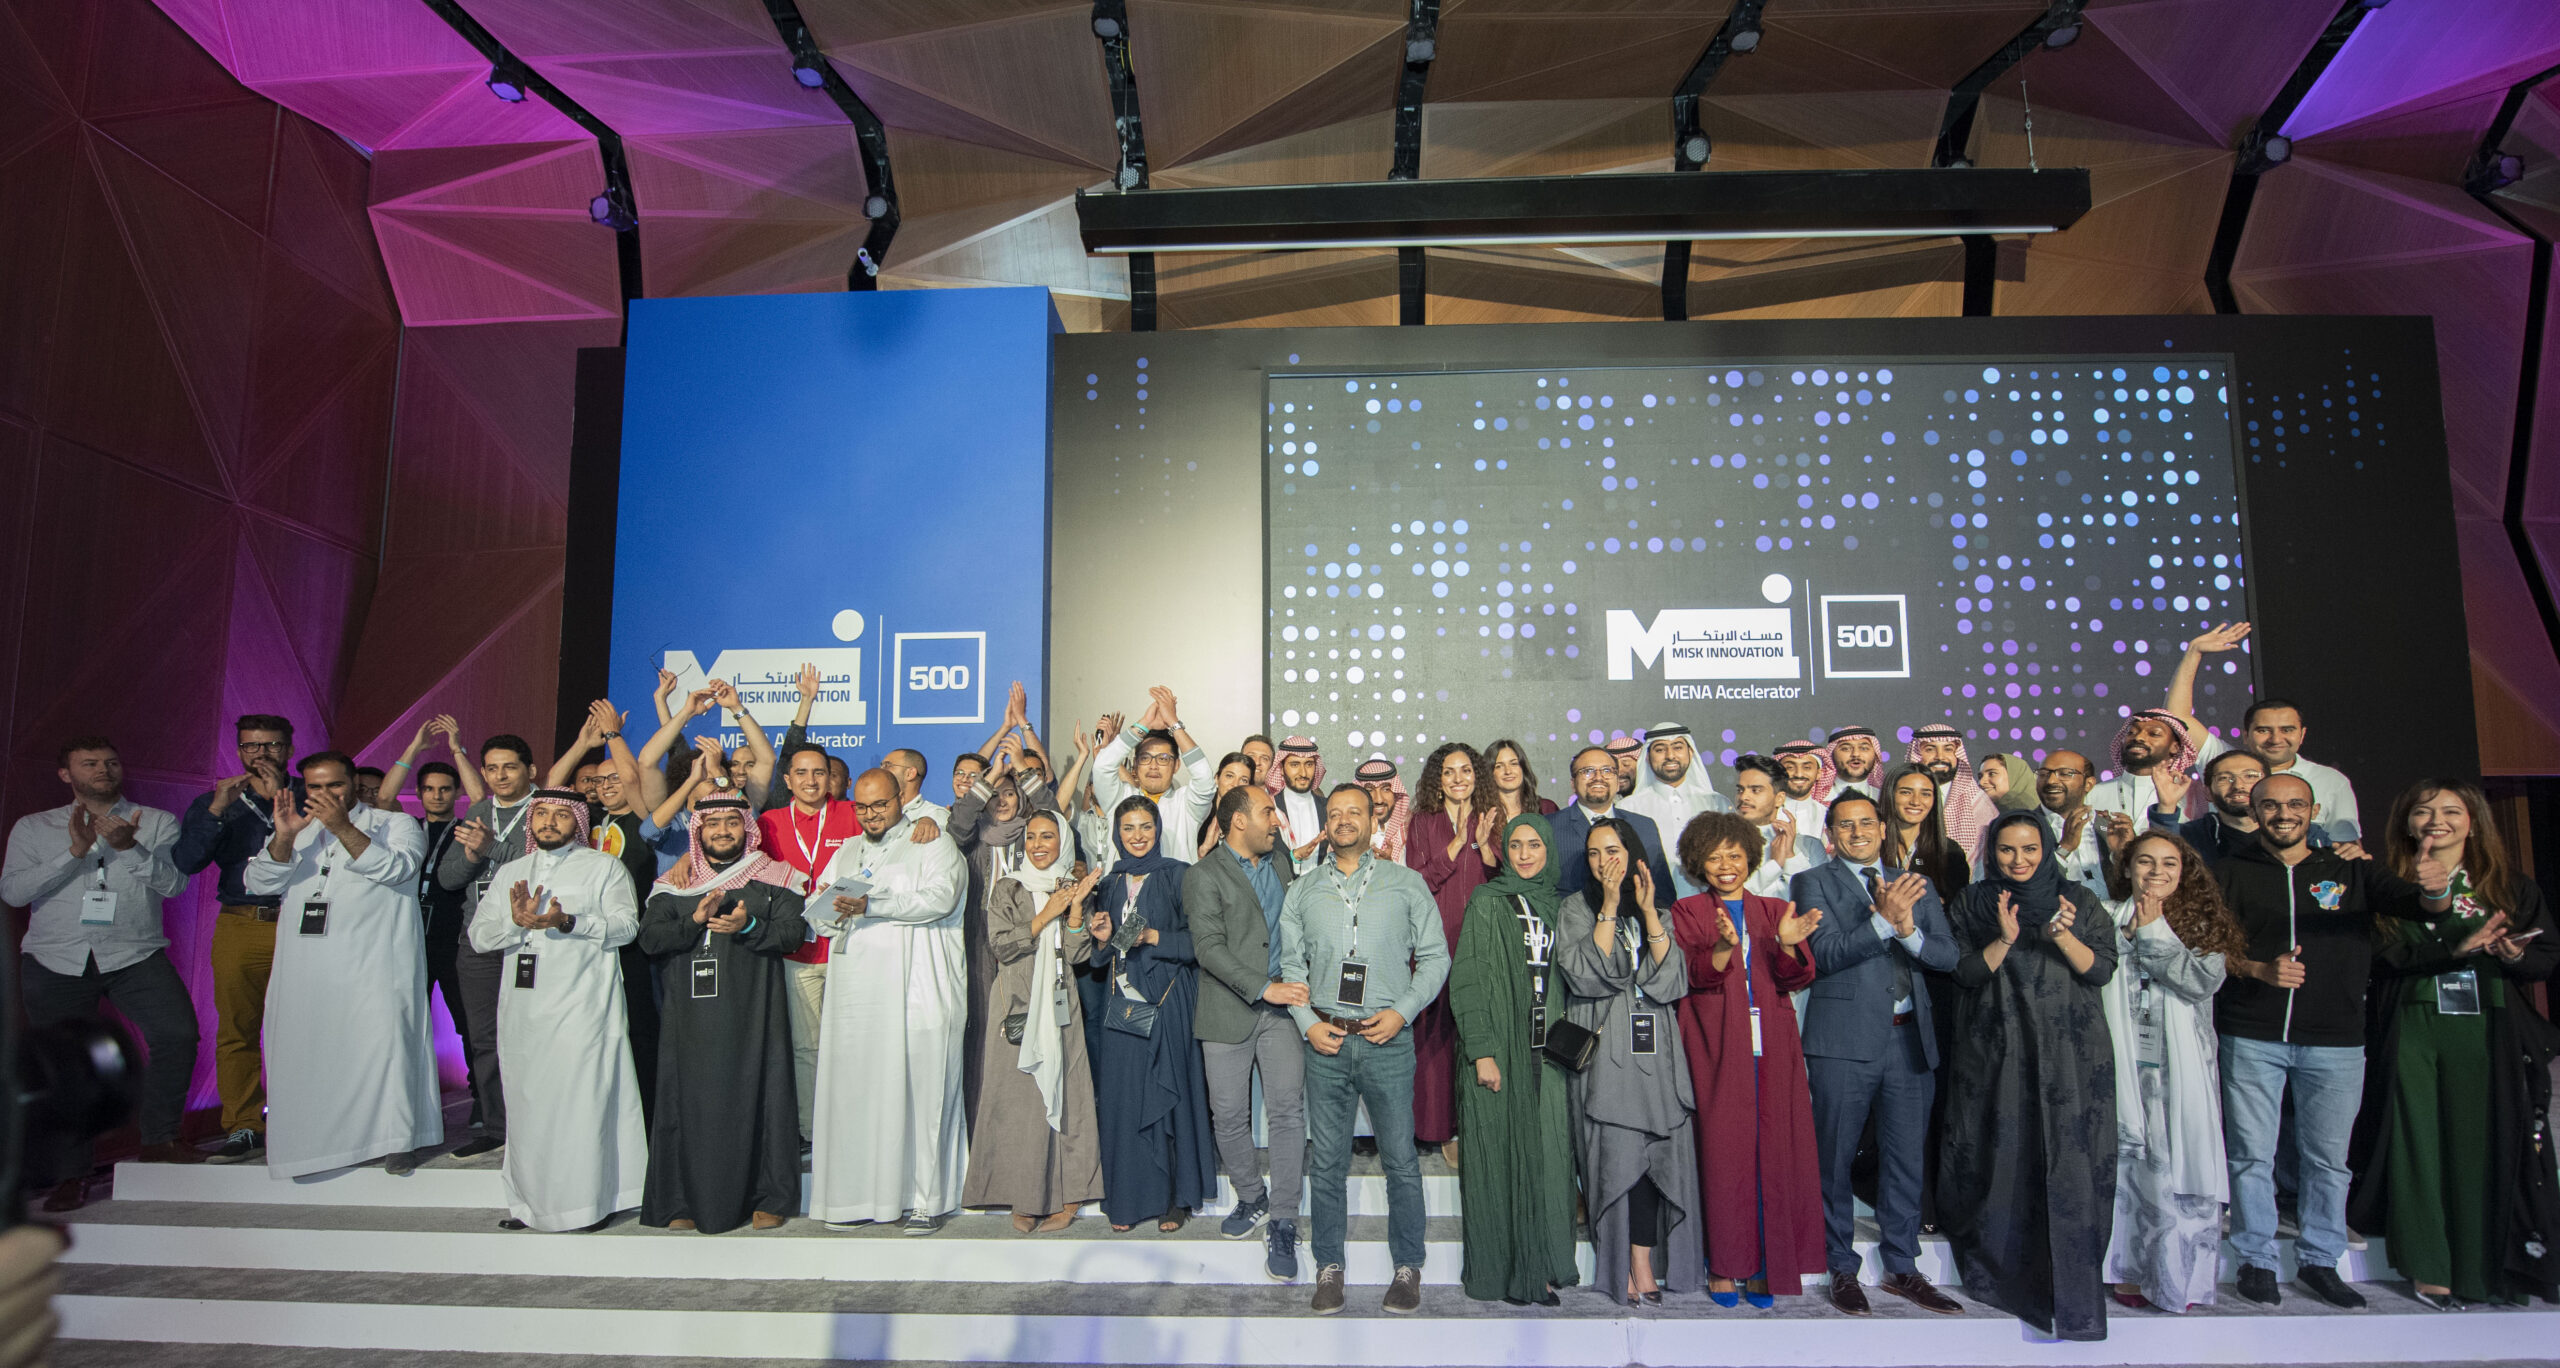 Misk 500 MENA Accelerator Celebrates First Demo Day